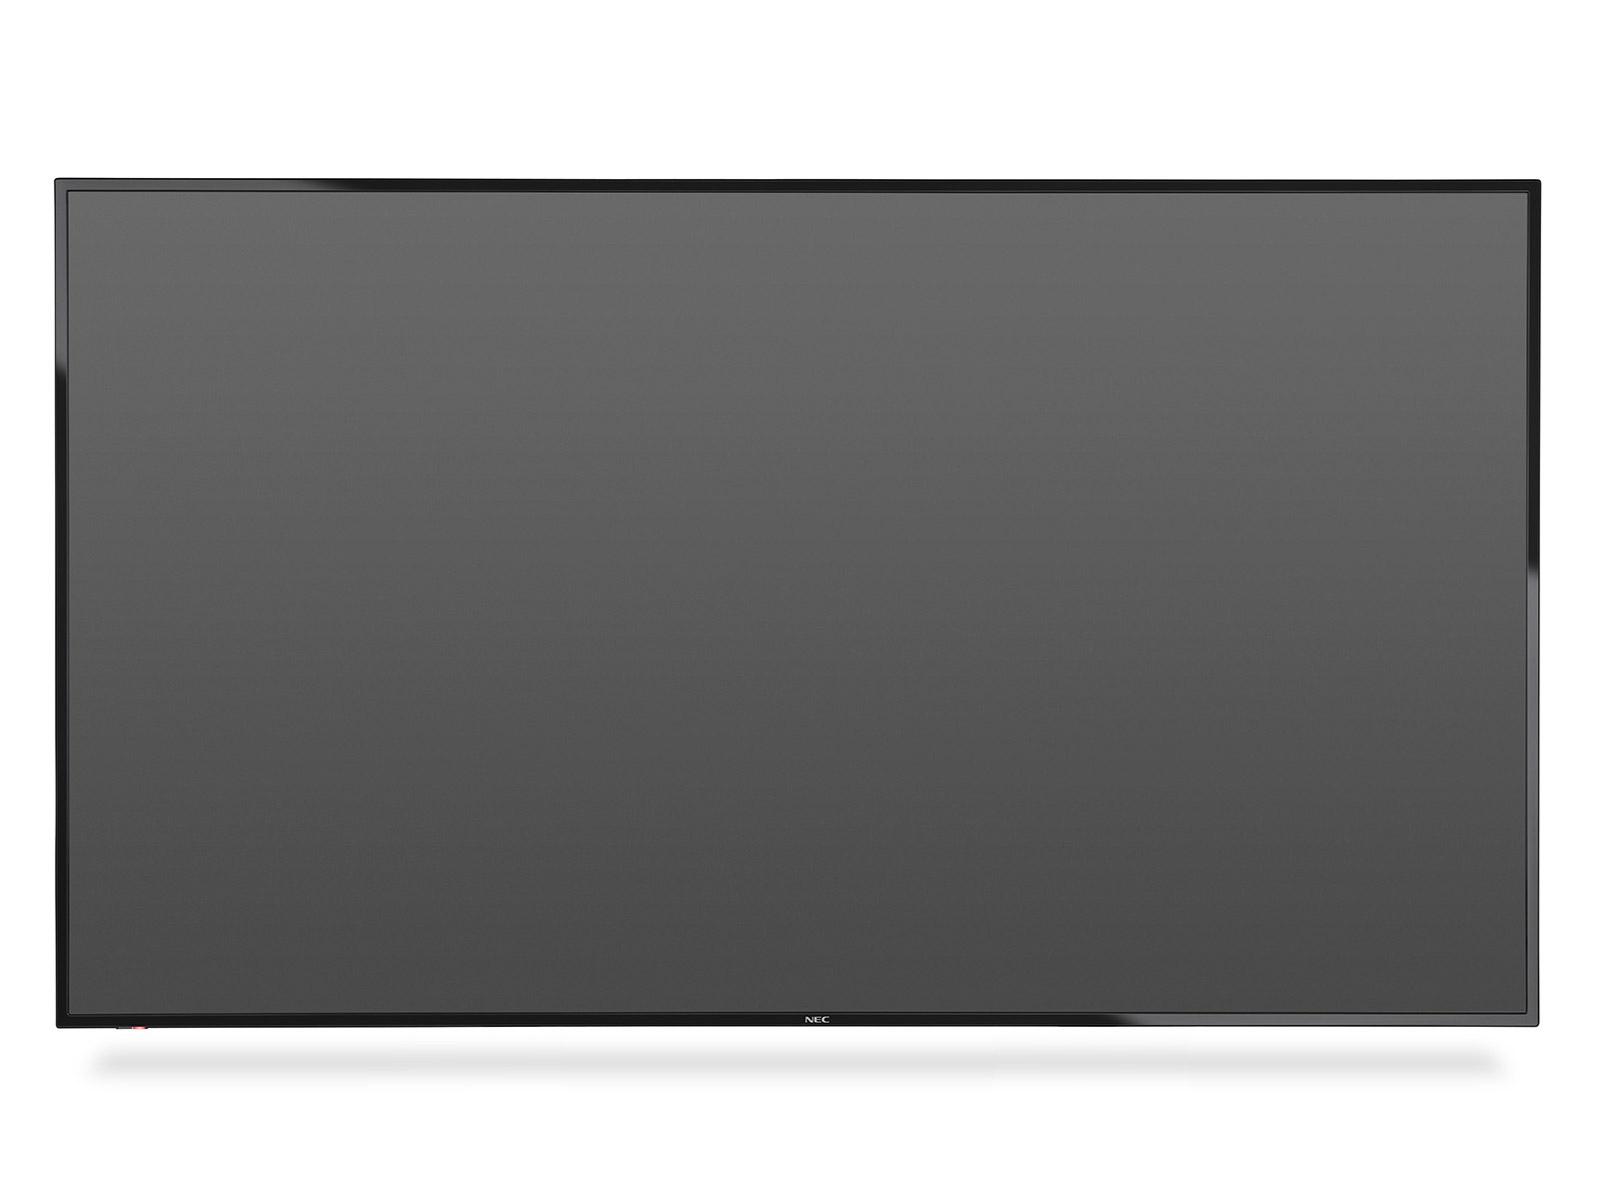 60004024